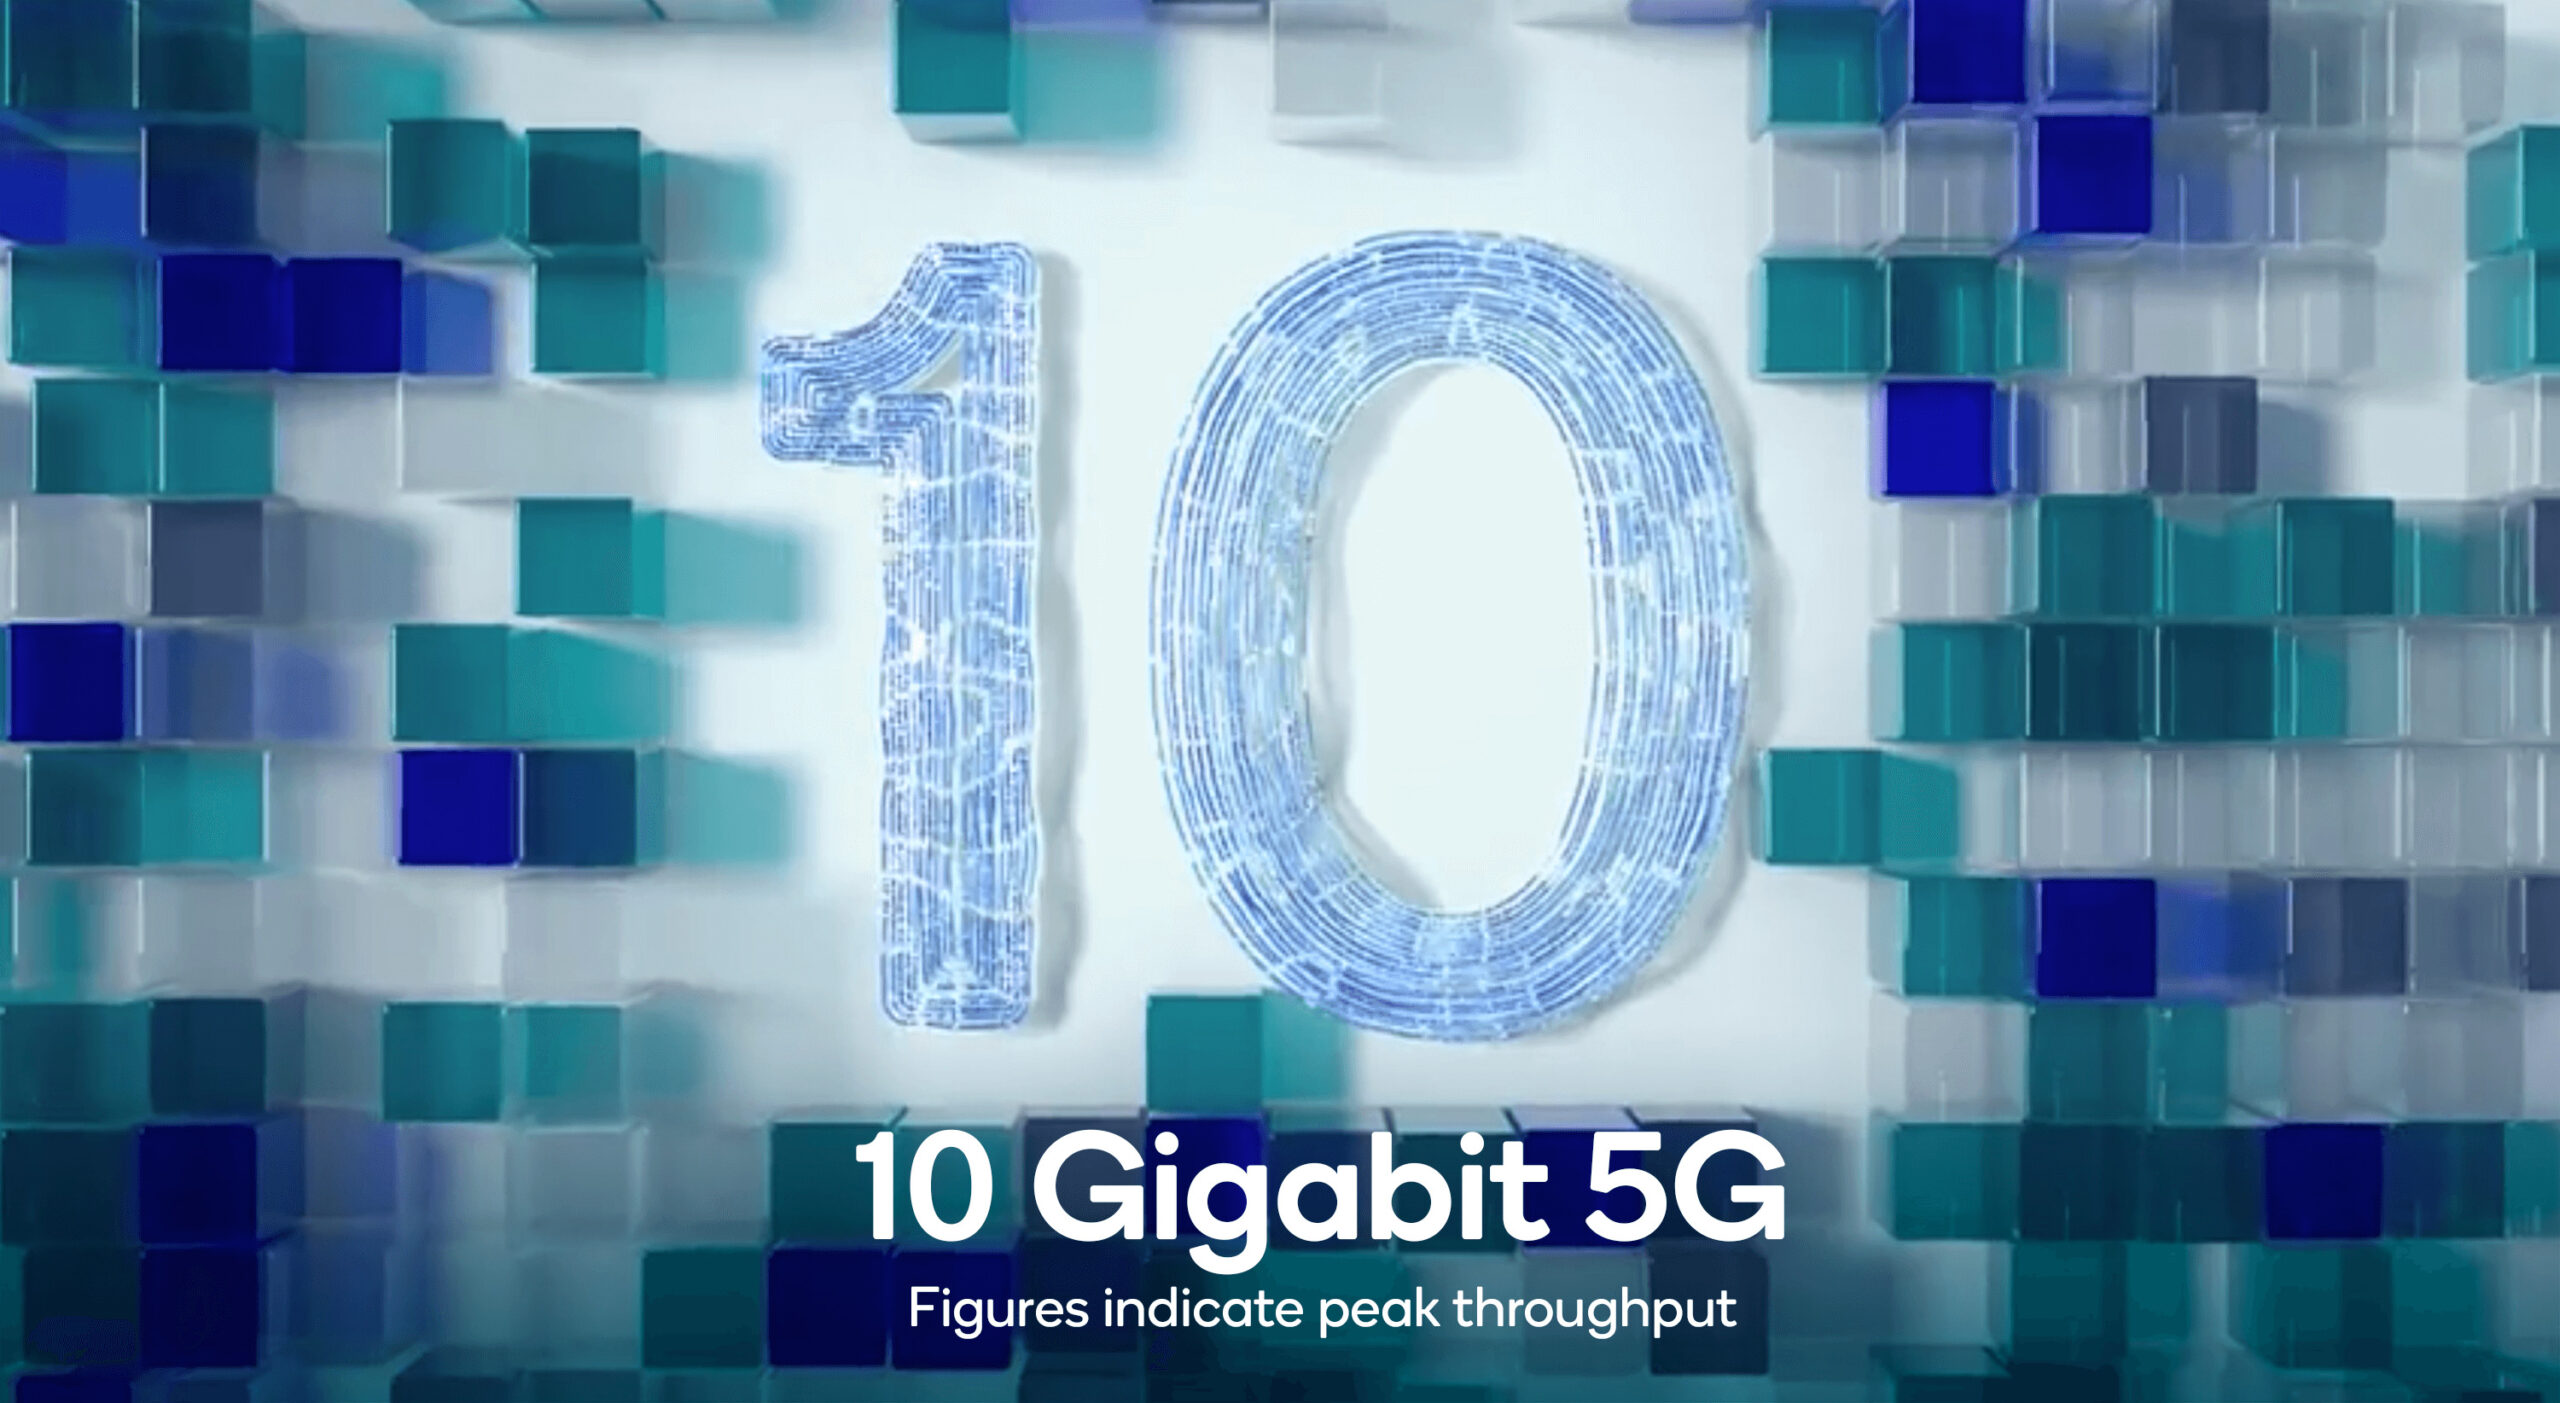 10 Gigabit 5G2